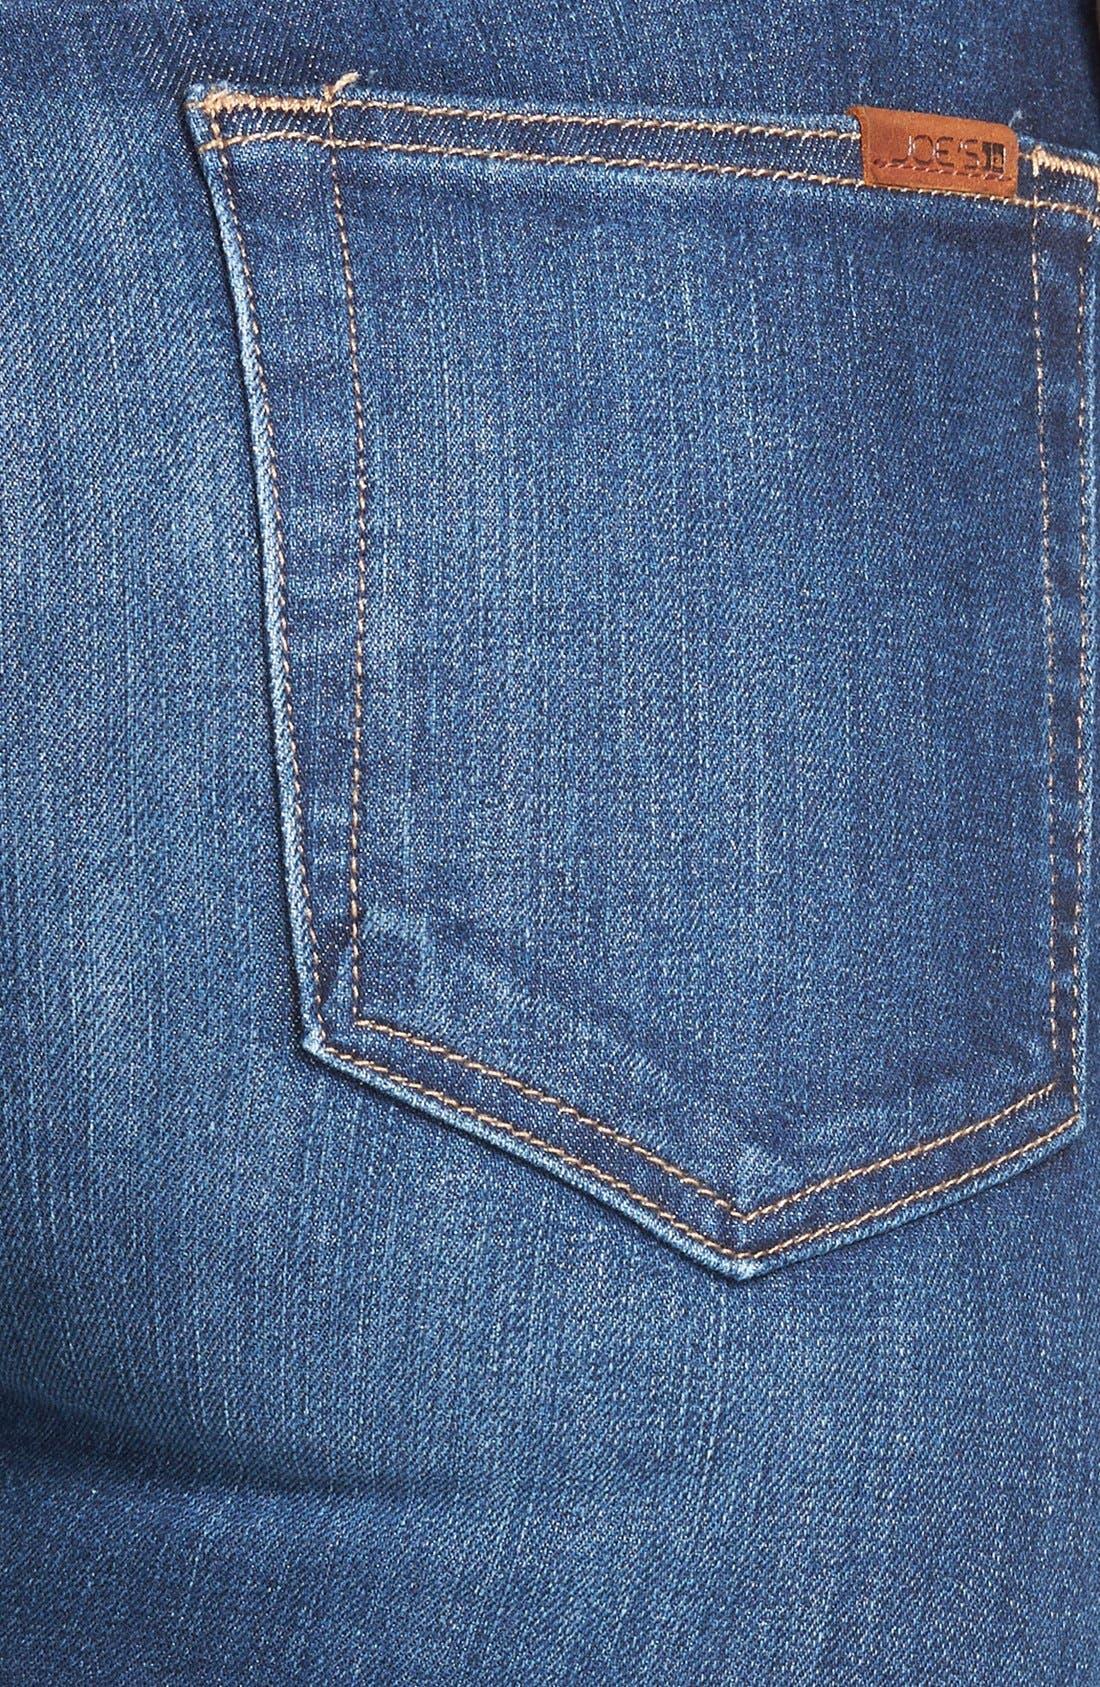 Alternate Image 3  - Joe's 'Flawless' High Rise Skinny Jeans (Acadia)